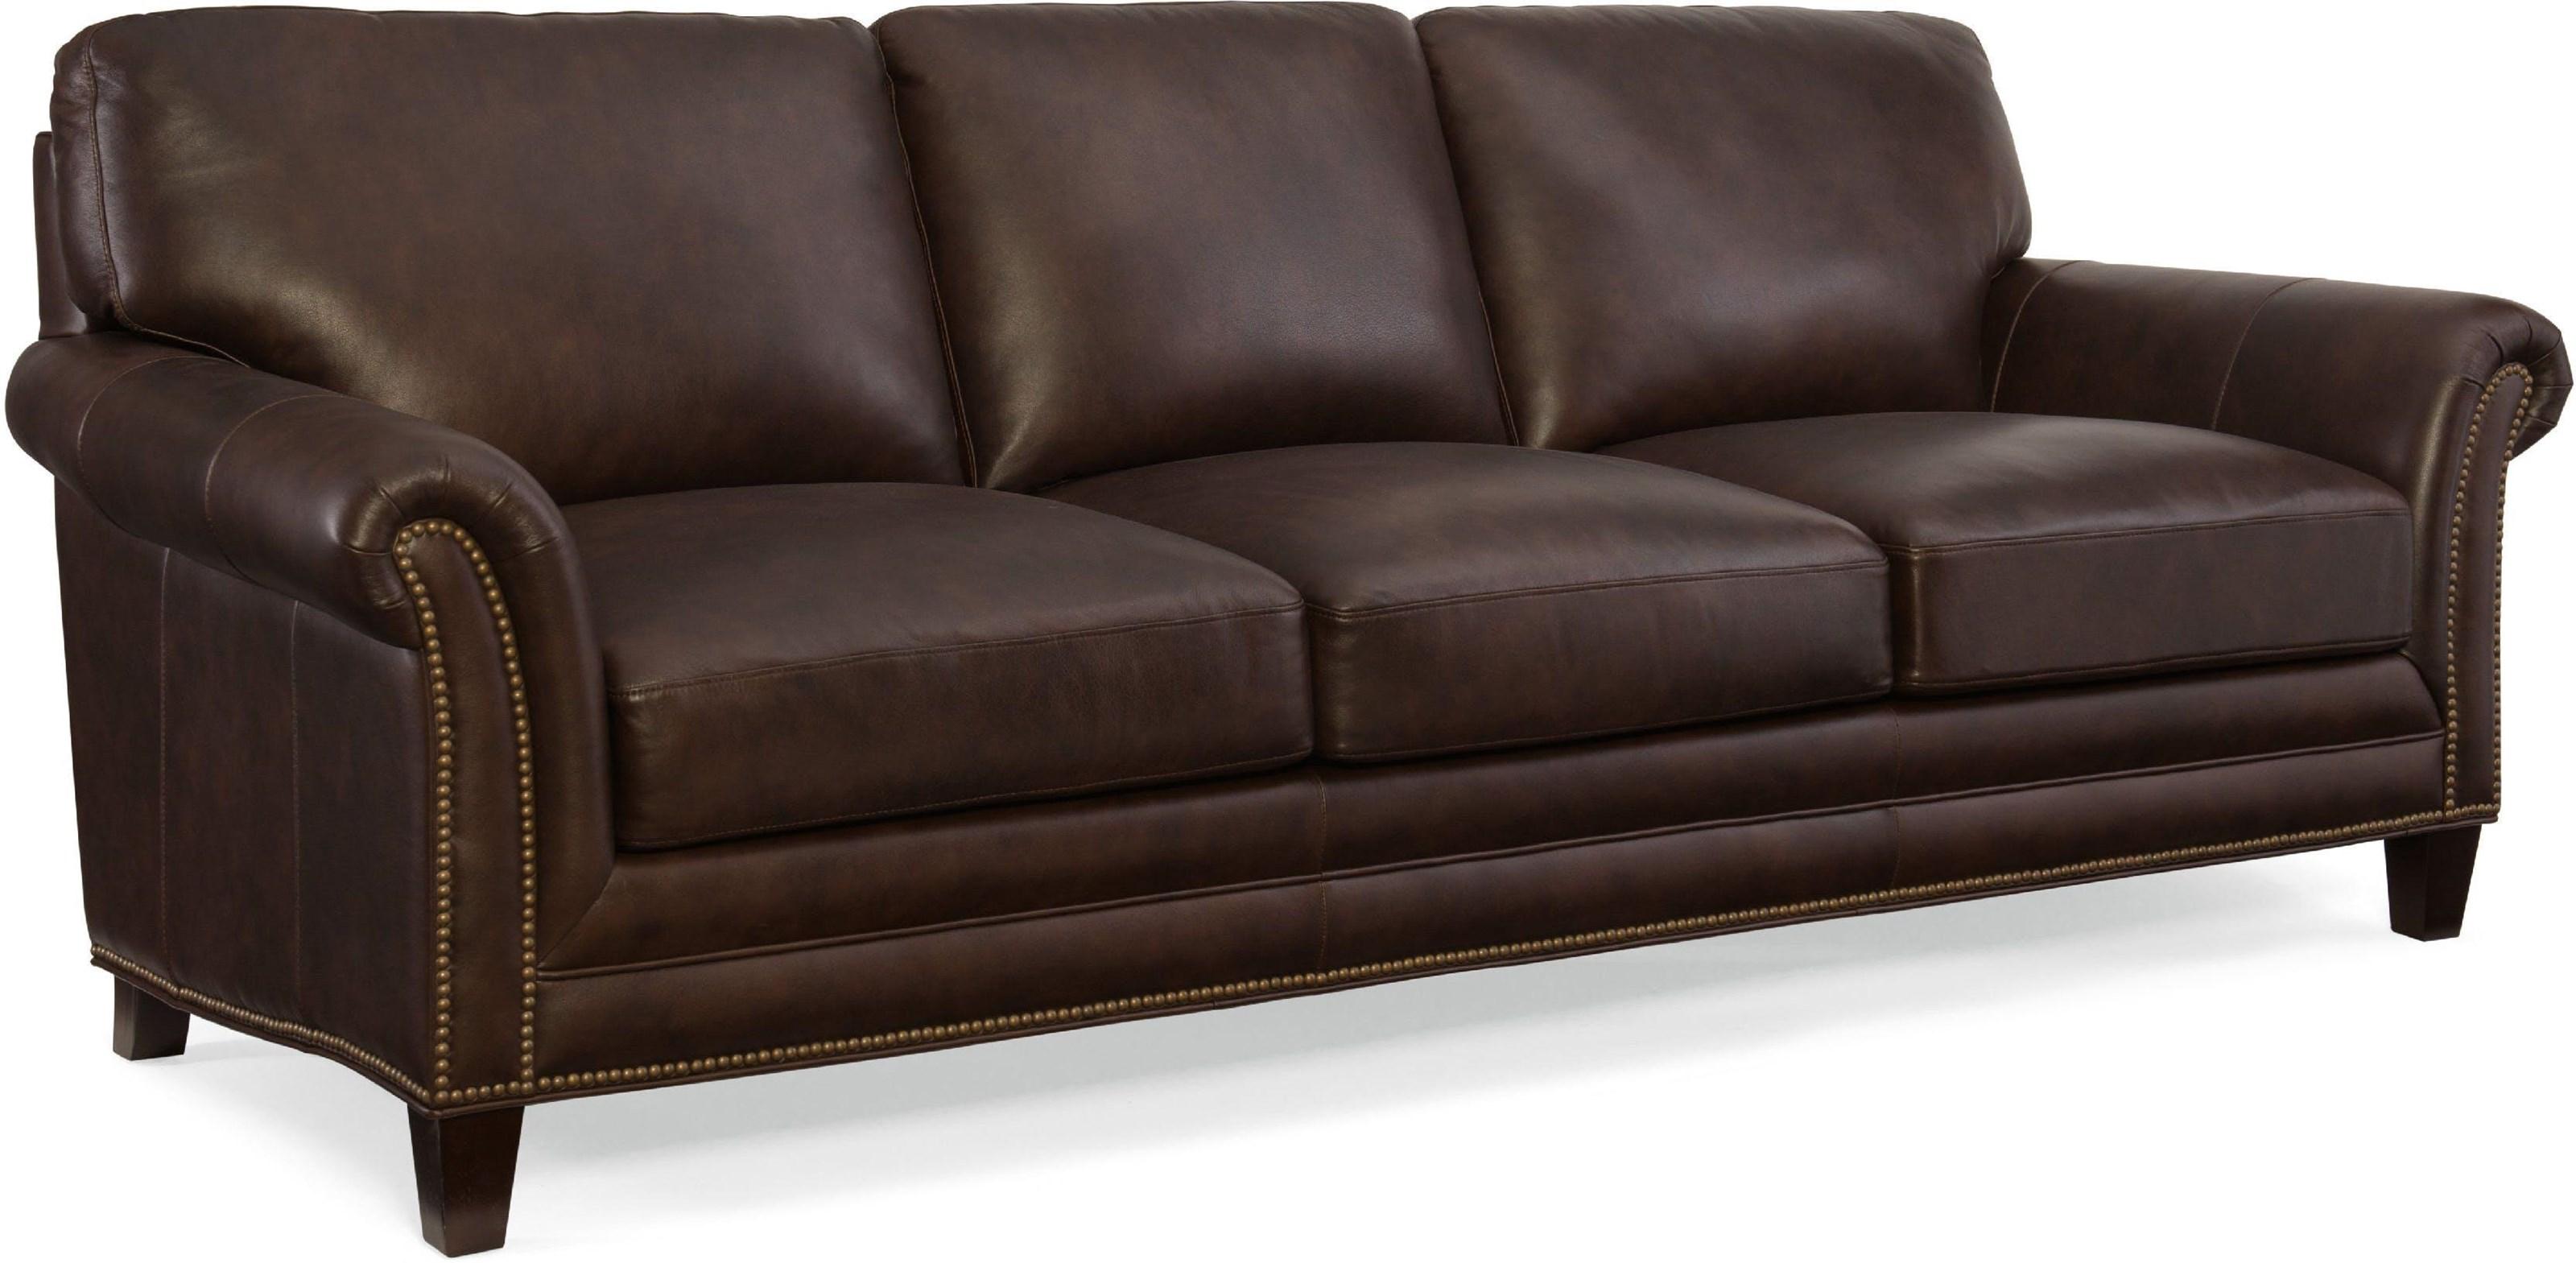 Stationary Sofa with Nailhead Trim